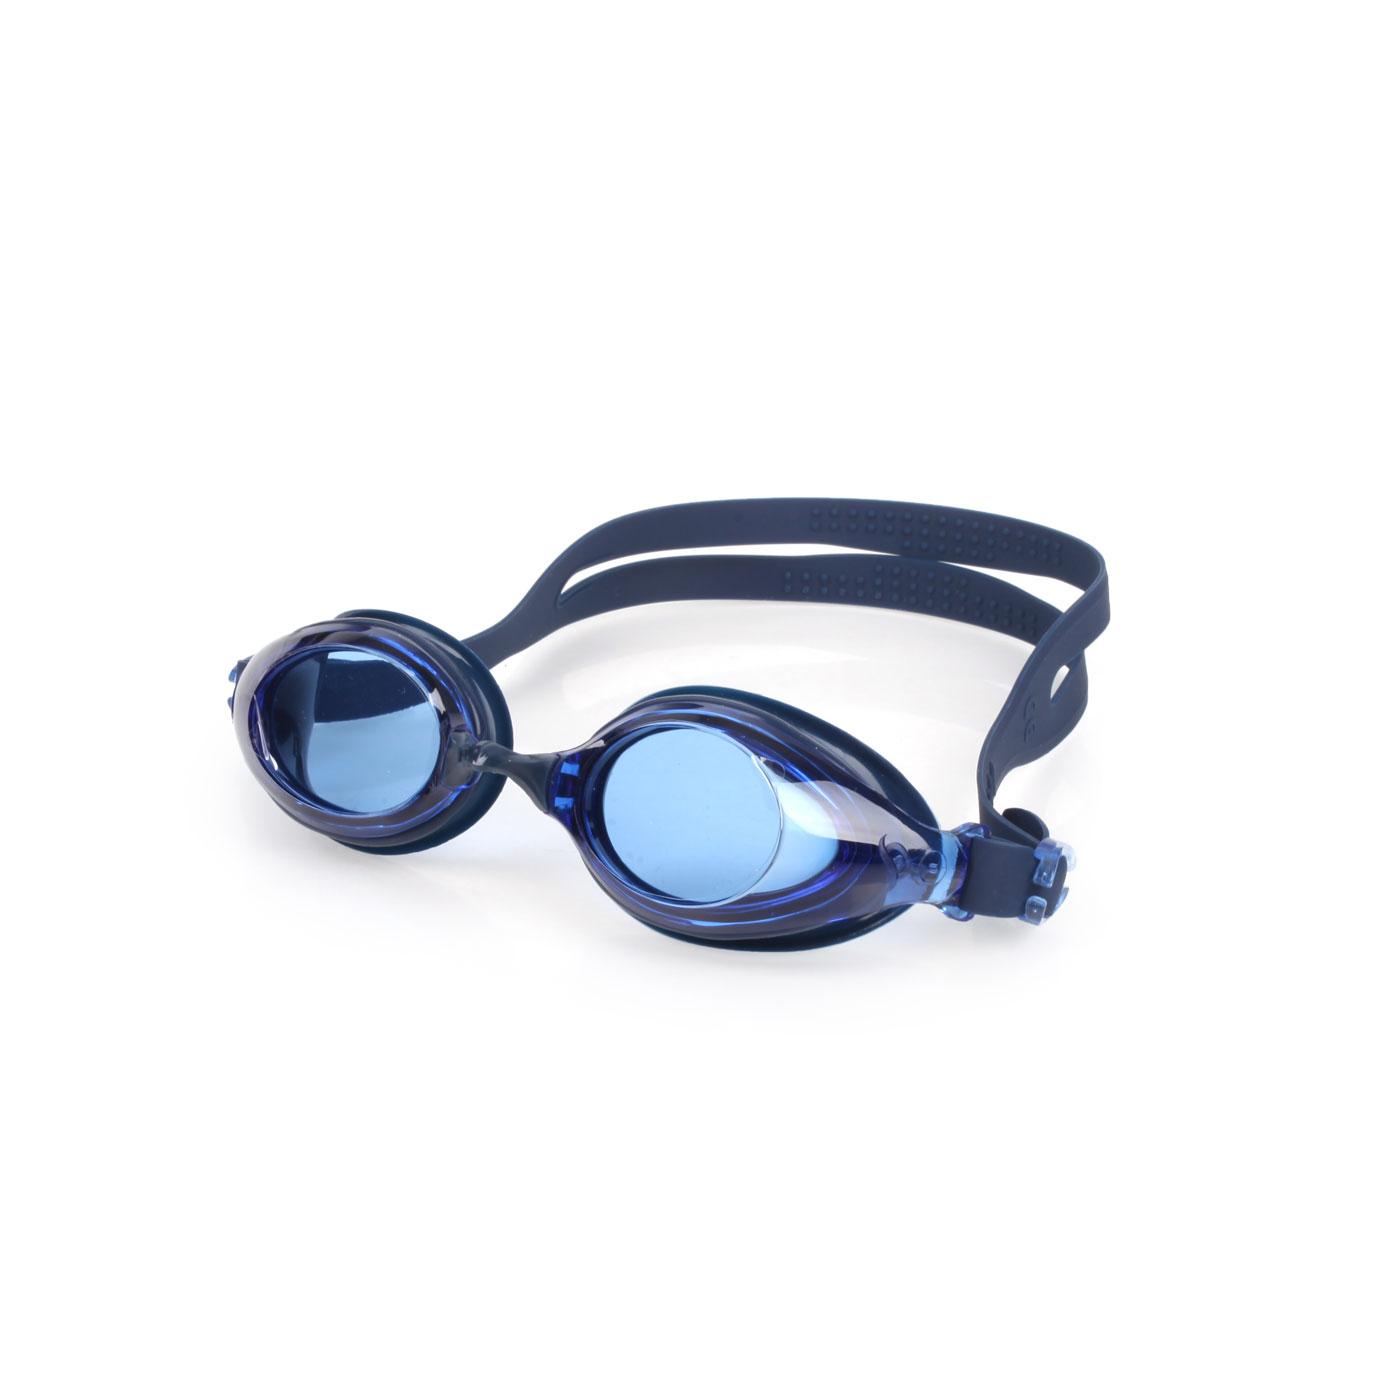 SABLE 935T平光大童泳鏡 935TC31 - 海軍藍